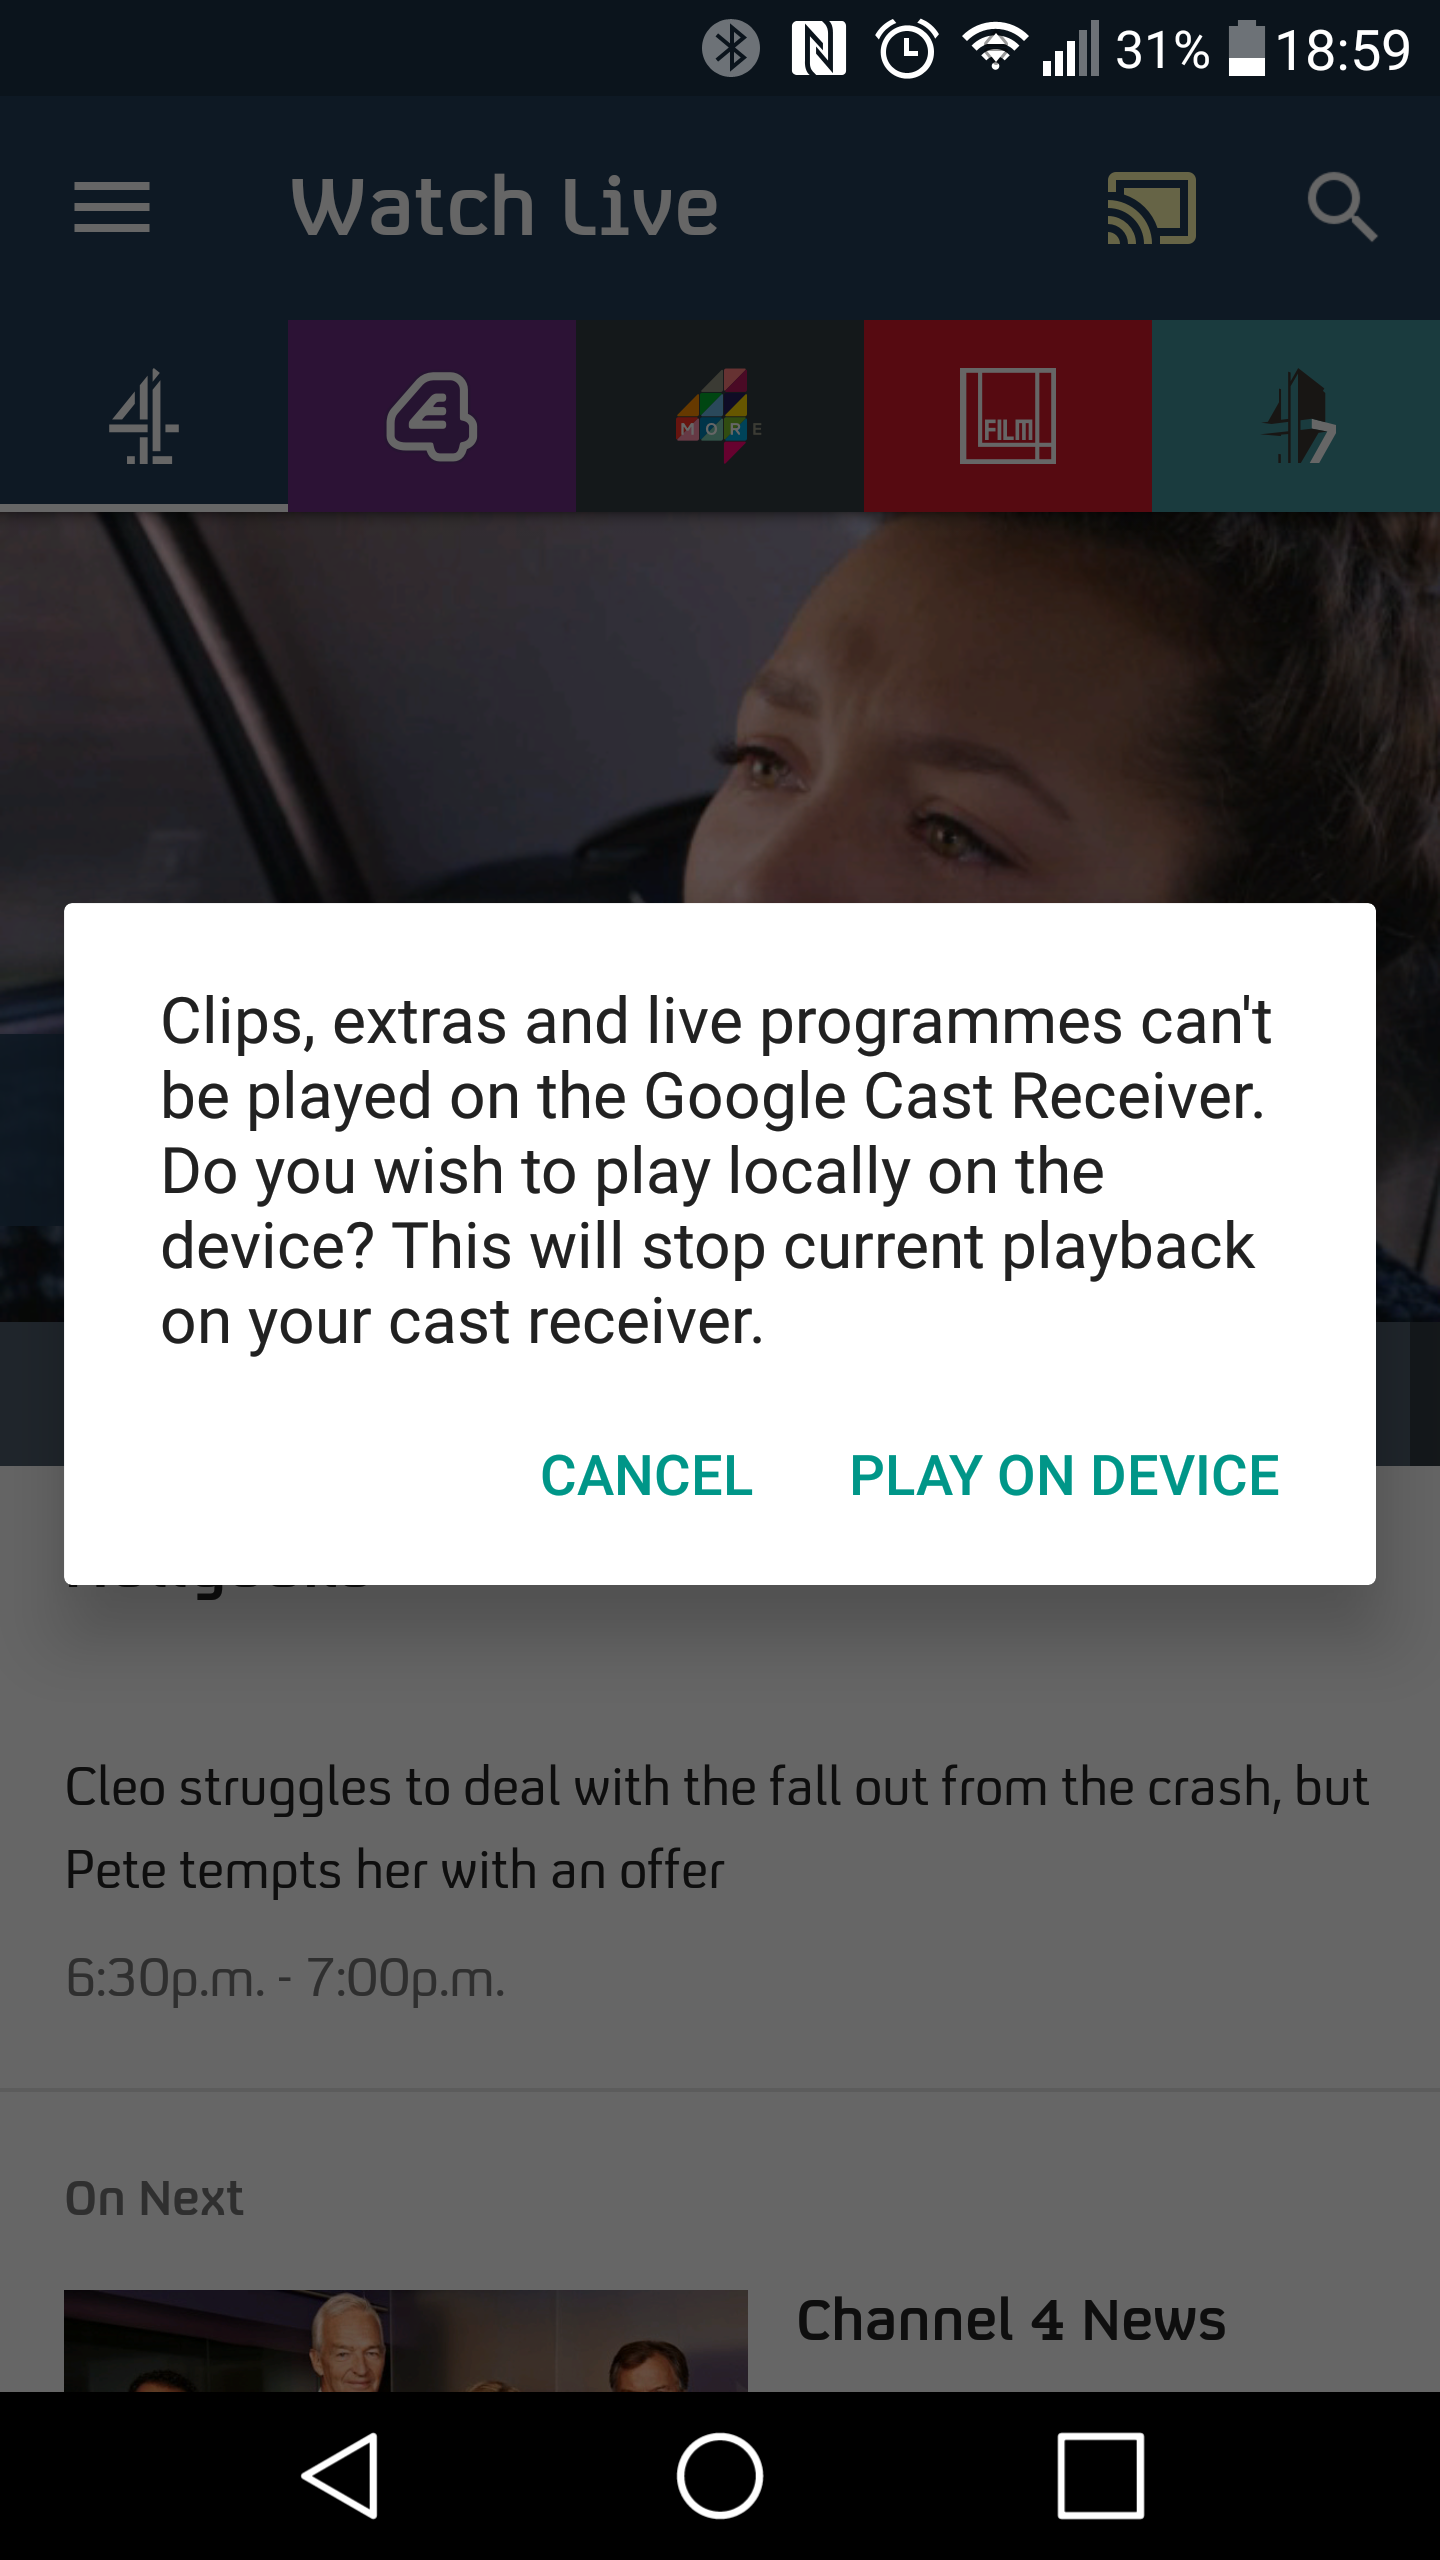 Live C4 on a Chromecast? | AVForums